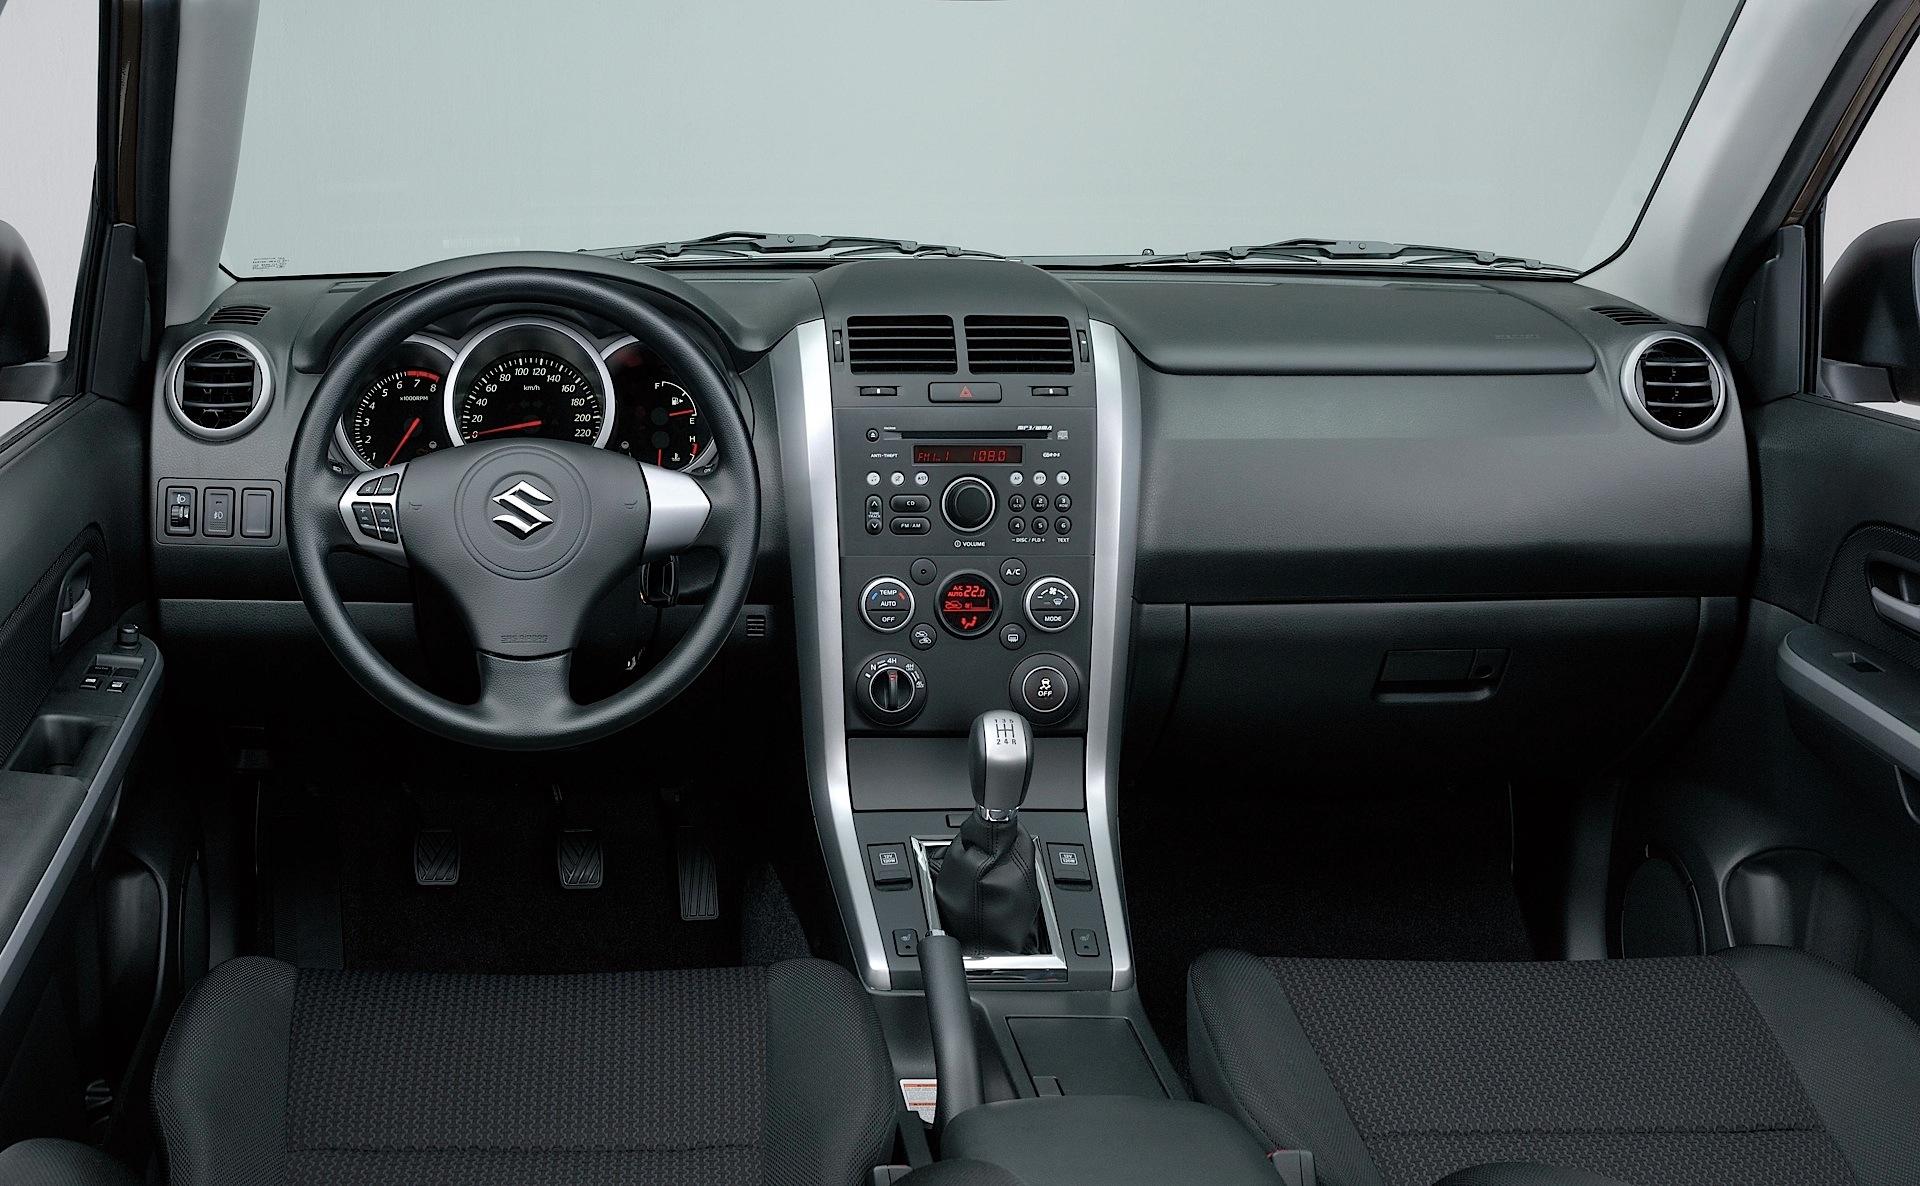 Suzuki Grand Vitara 5 Doors Specs 2008 2009 2010 2011